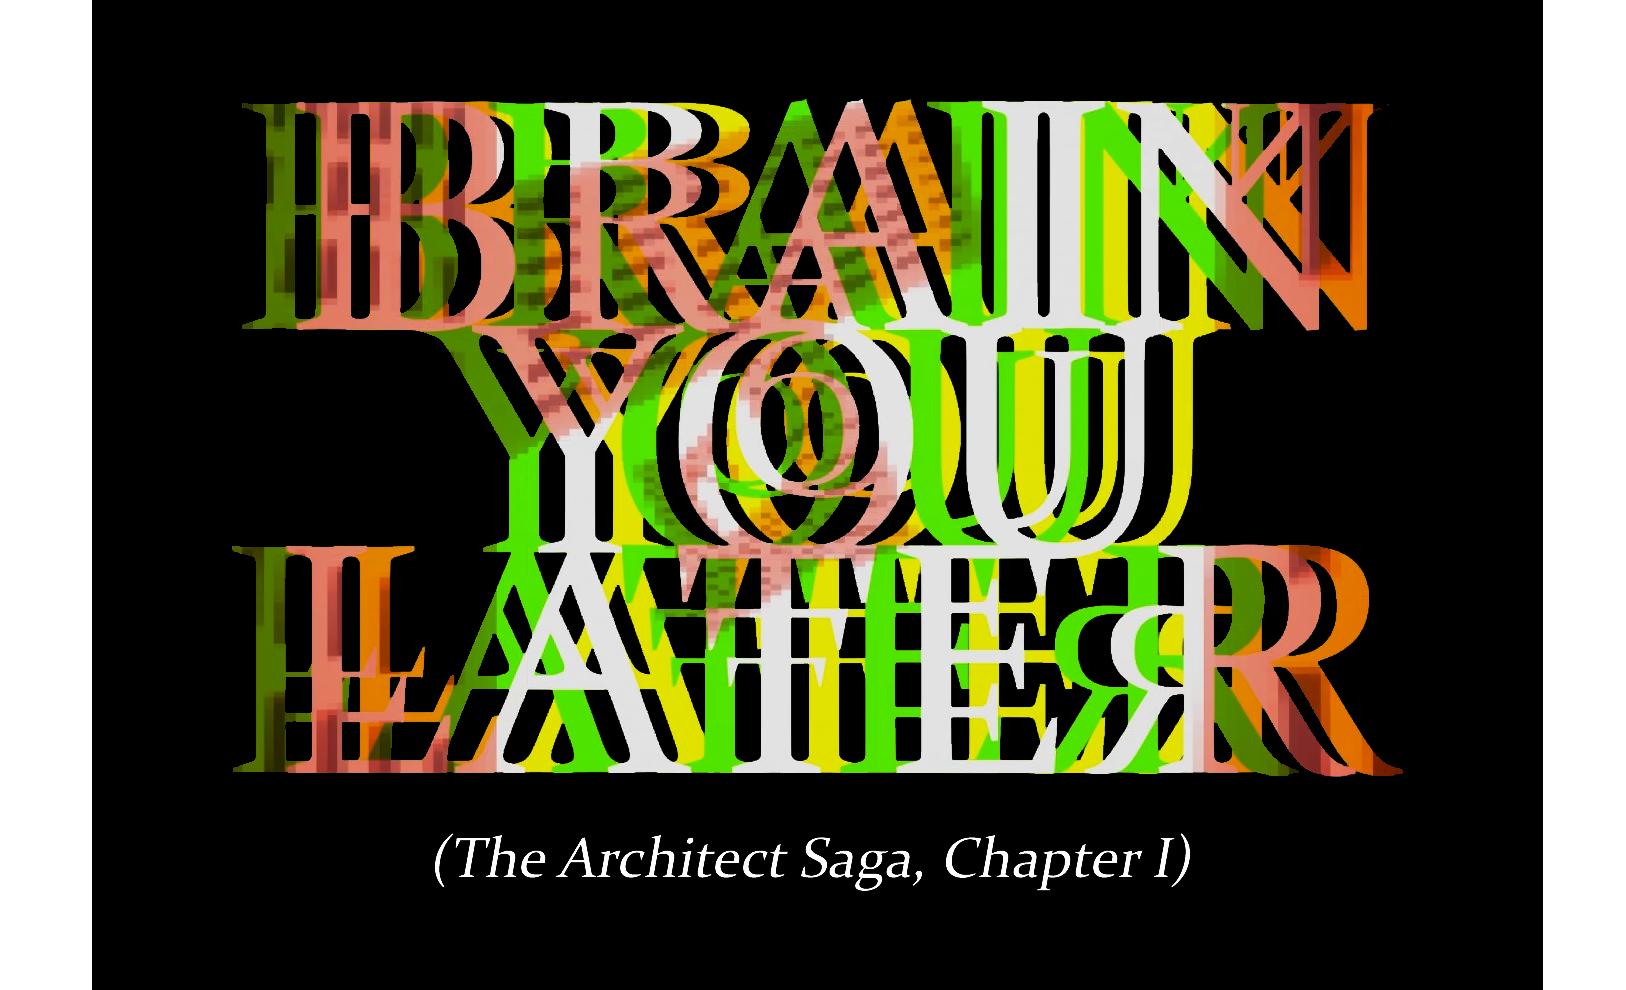 BRAIN YOU LATER (The Architect Saga, Chapter I)